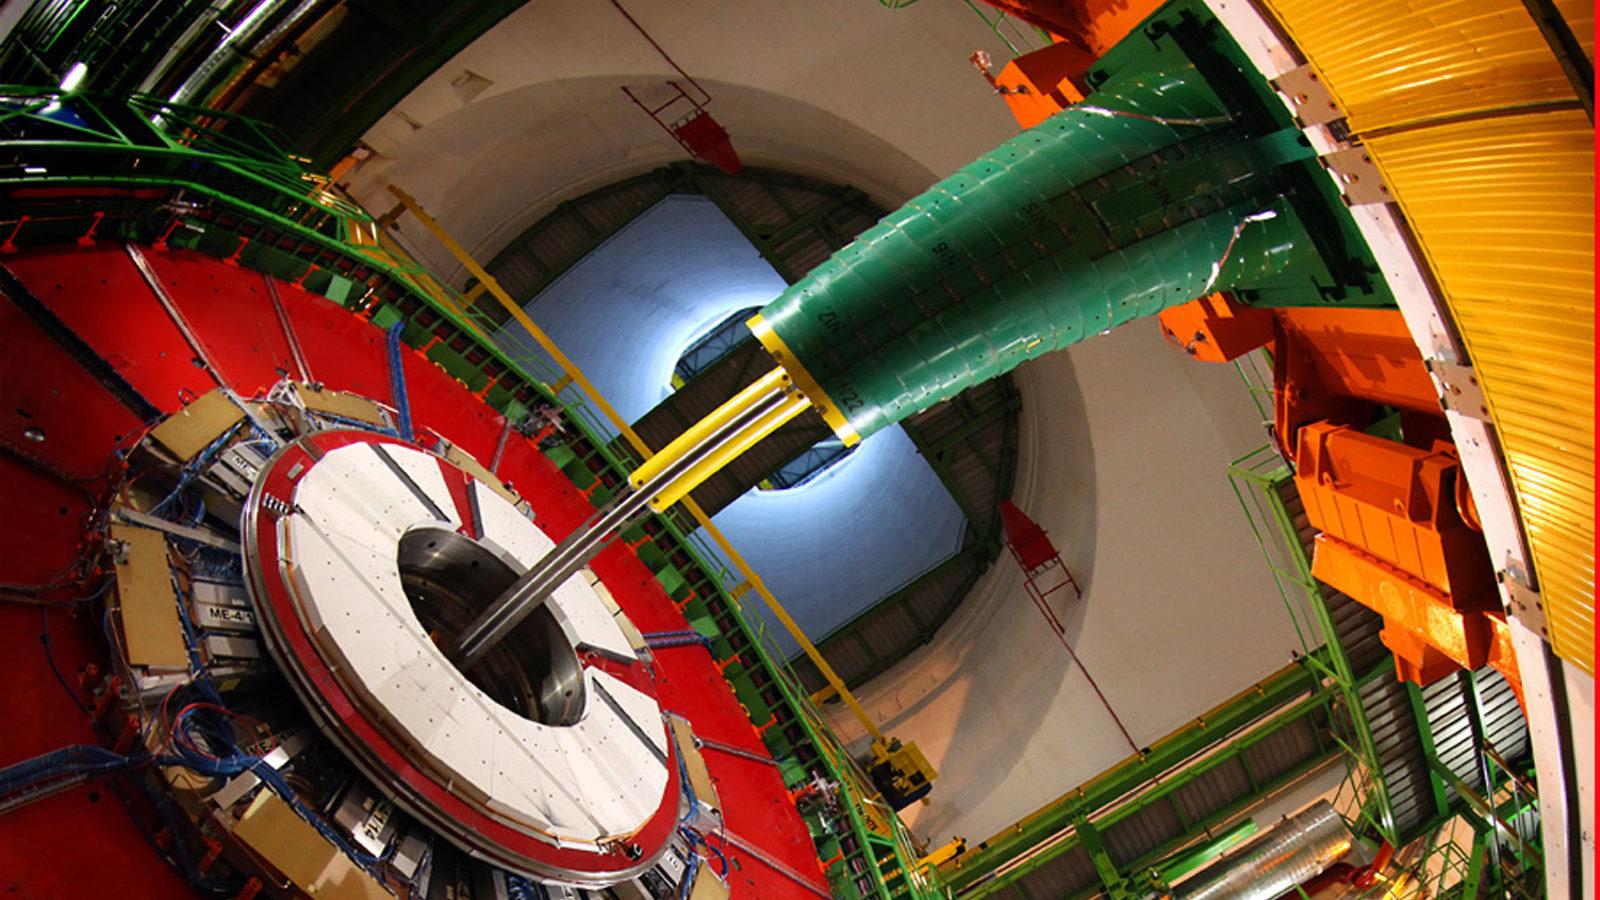 Photo: CMS detector below